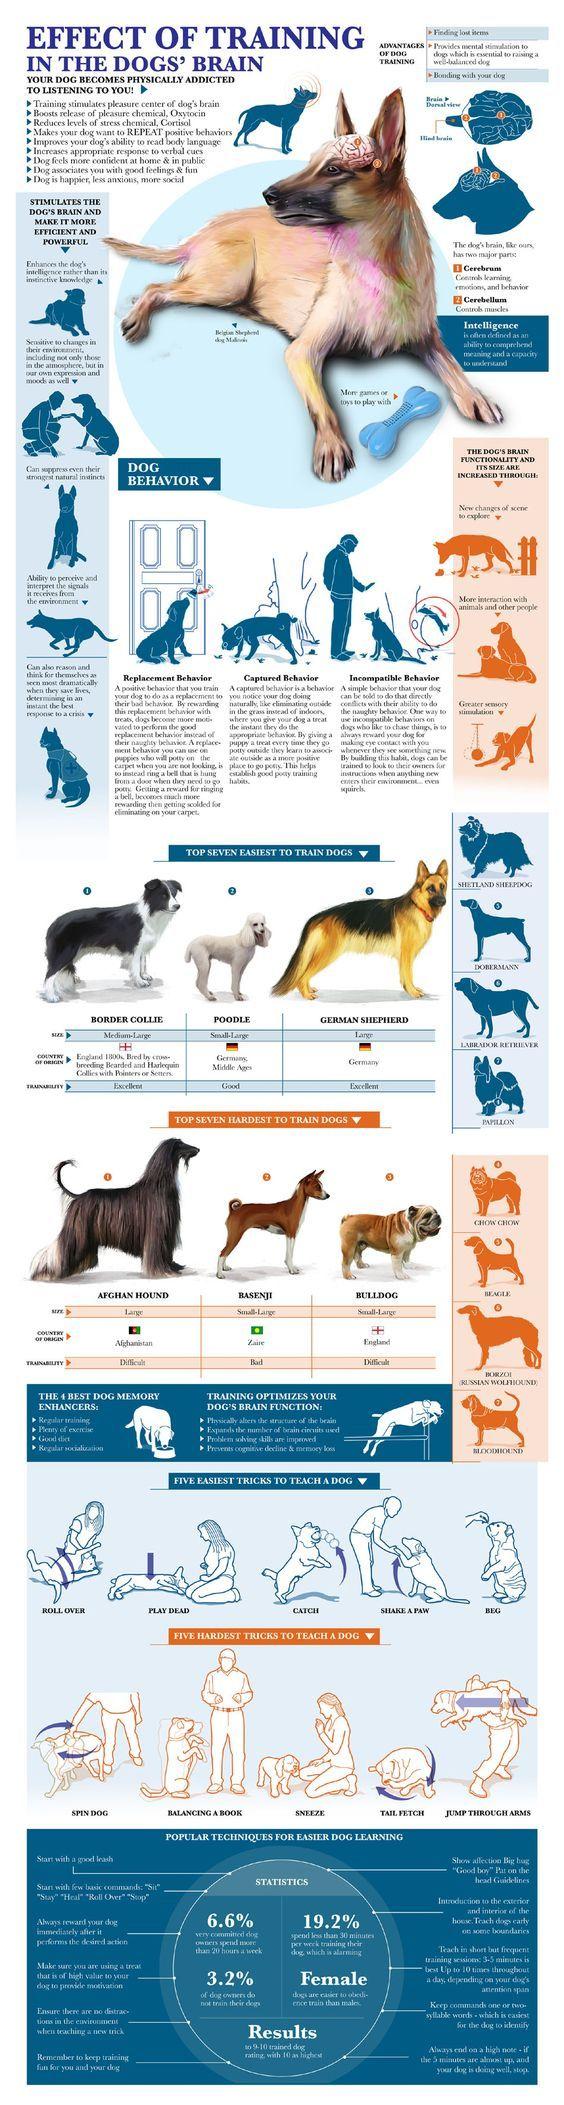 dog training infographic: